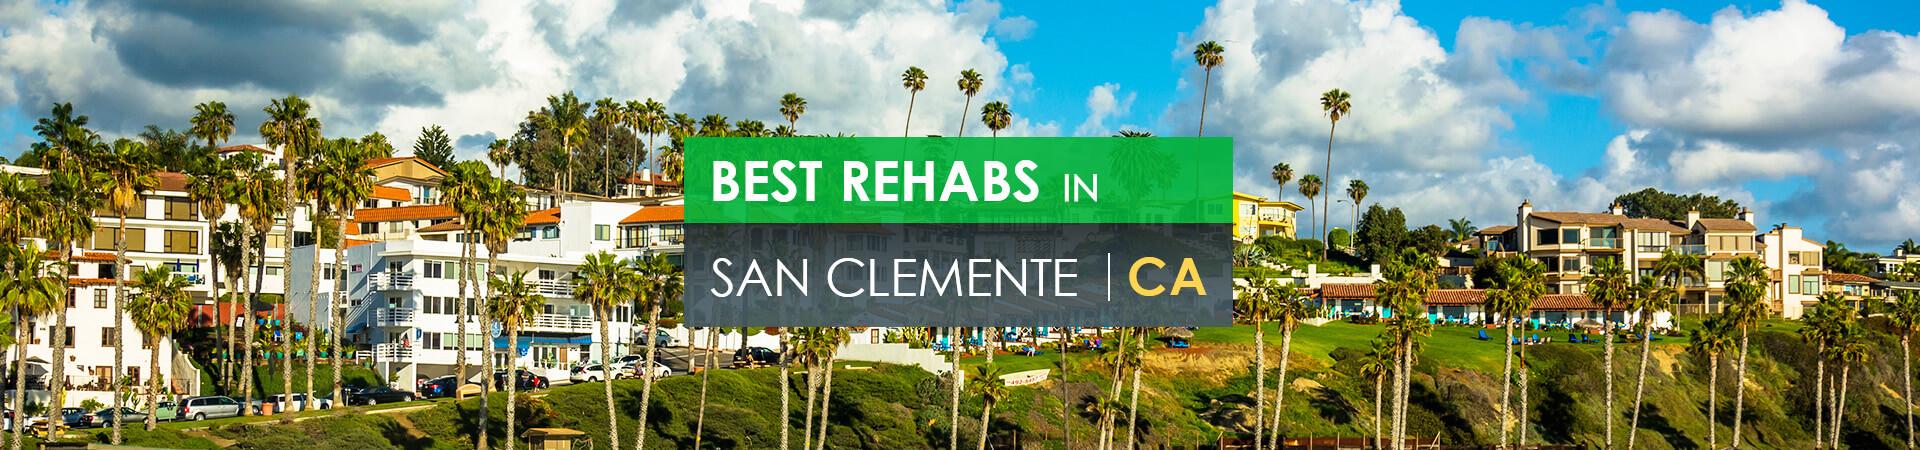 Best rehabs in San Clemente, CA